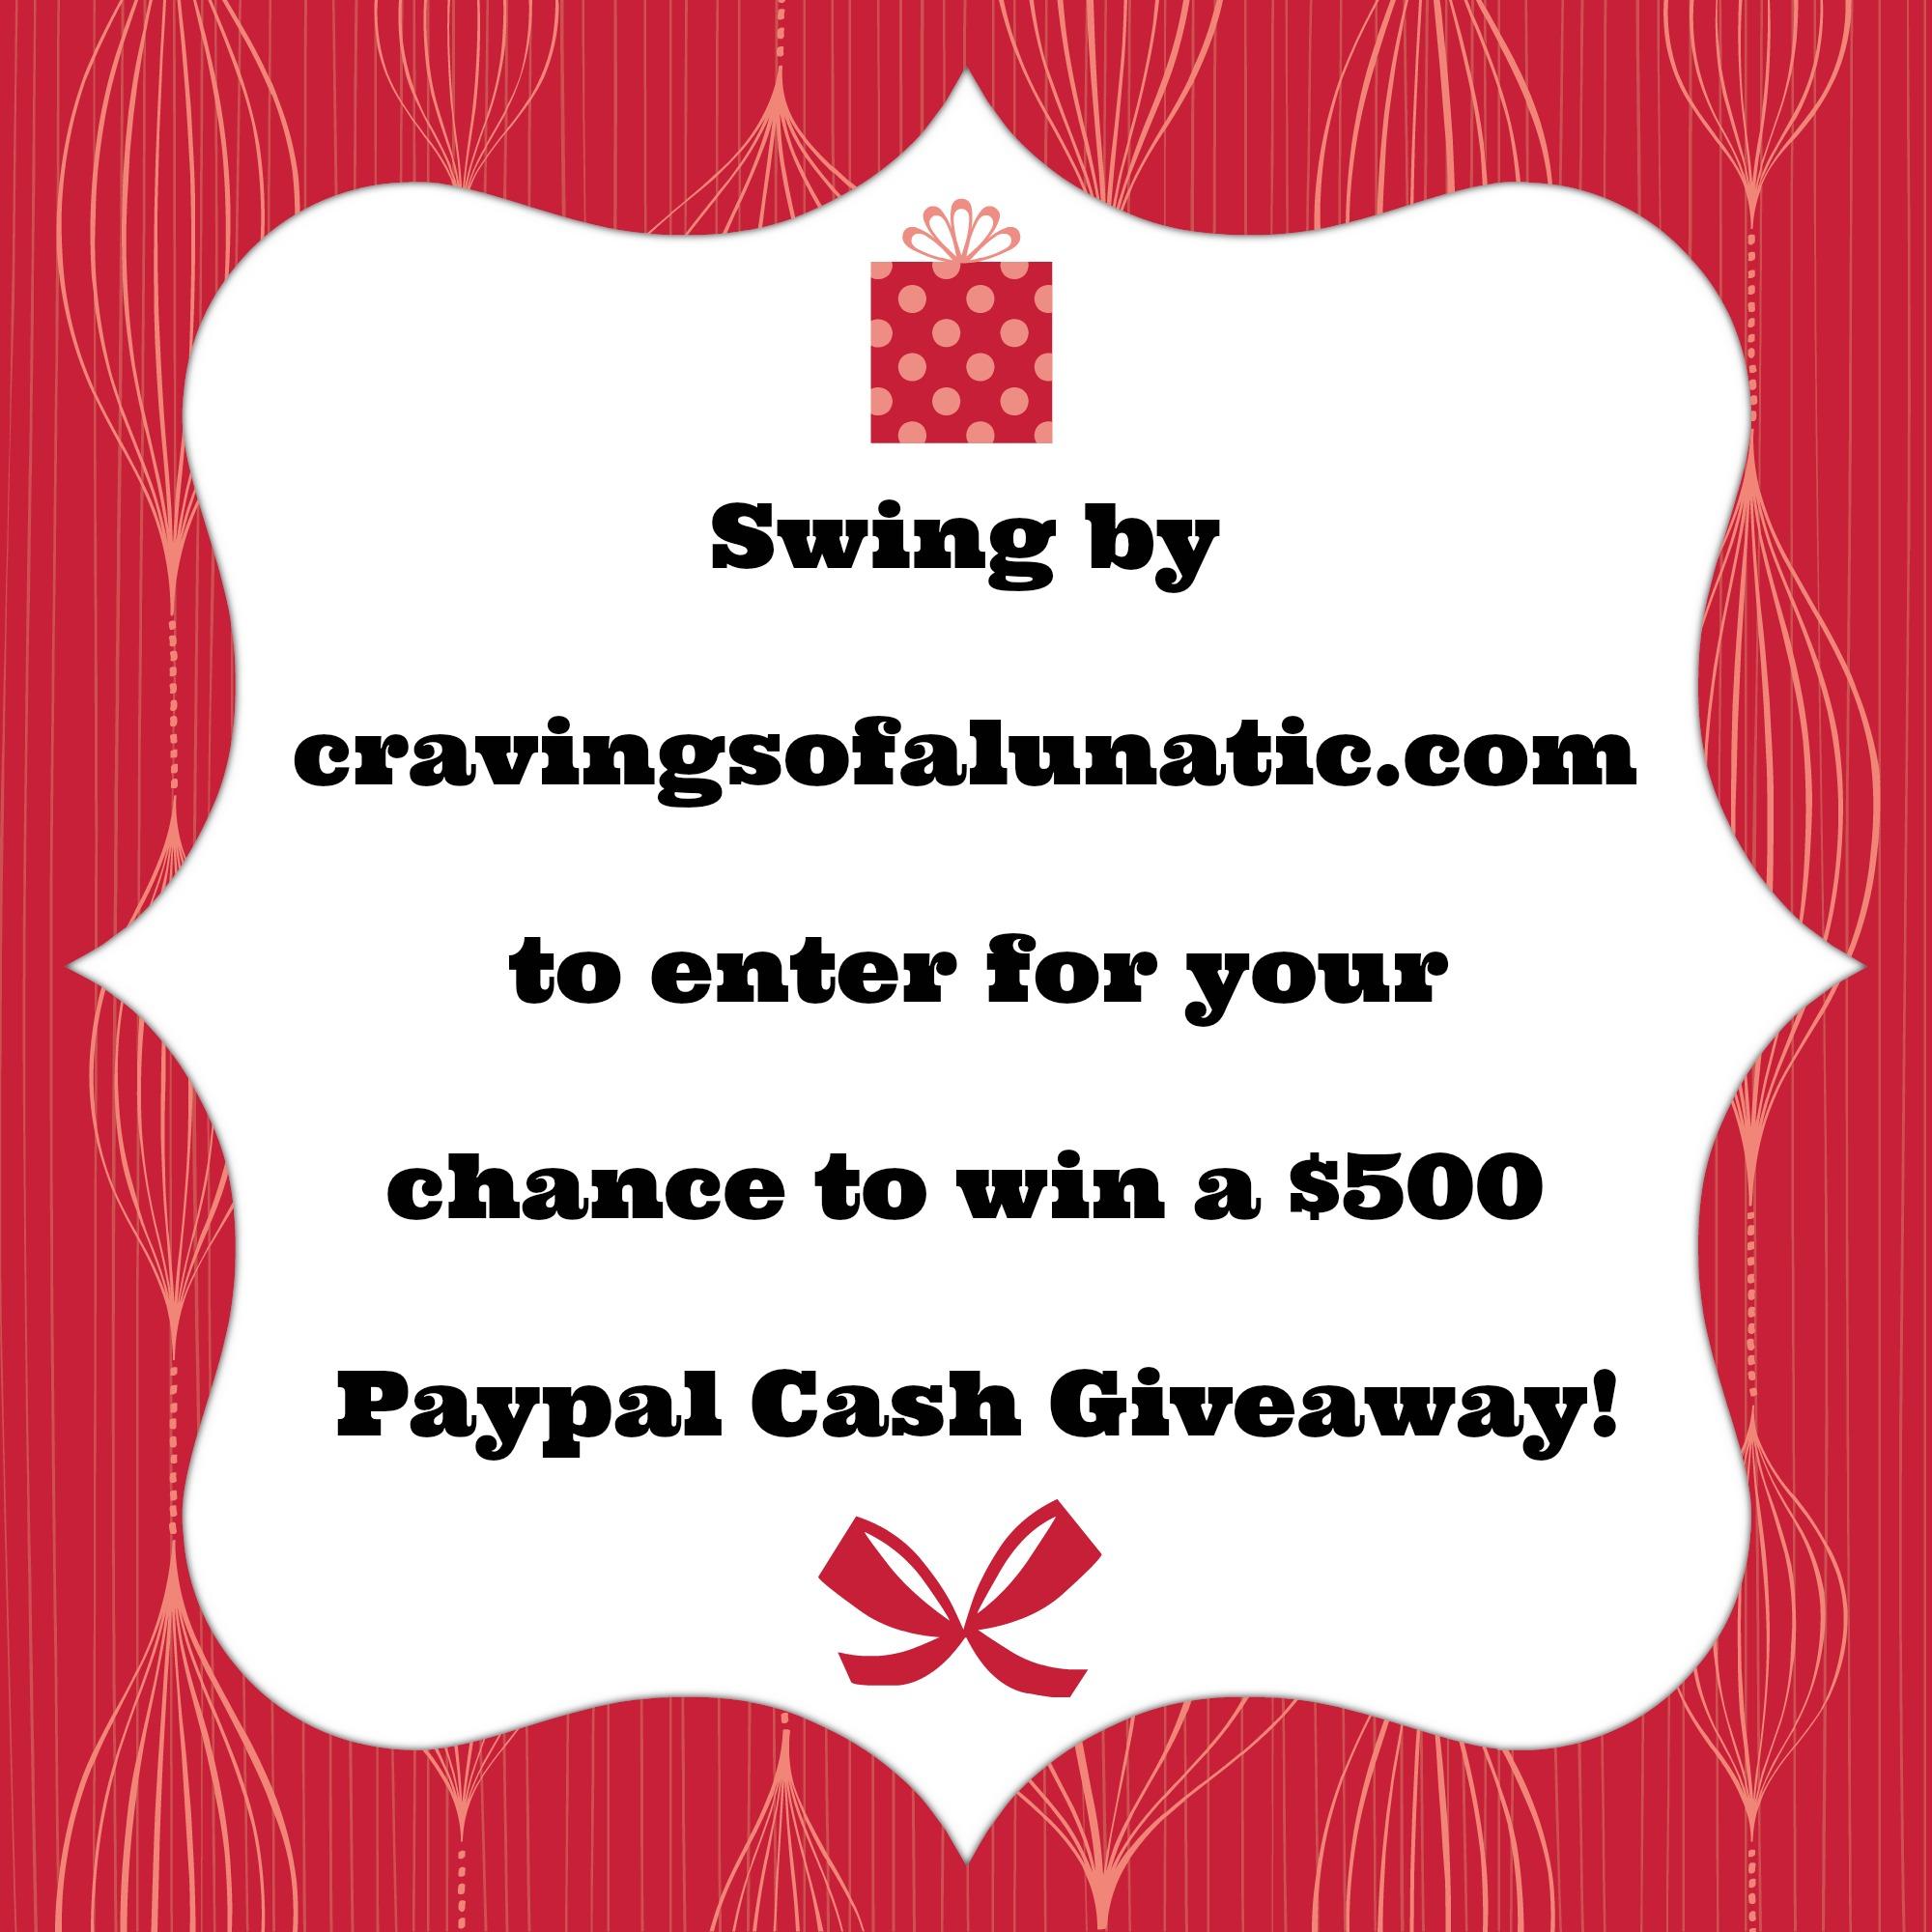 $500 Paypal Cash Giveaway on cravingsofalunatic.com- swing by to enter!!! (@CravingsLunatic)